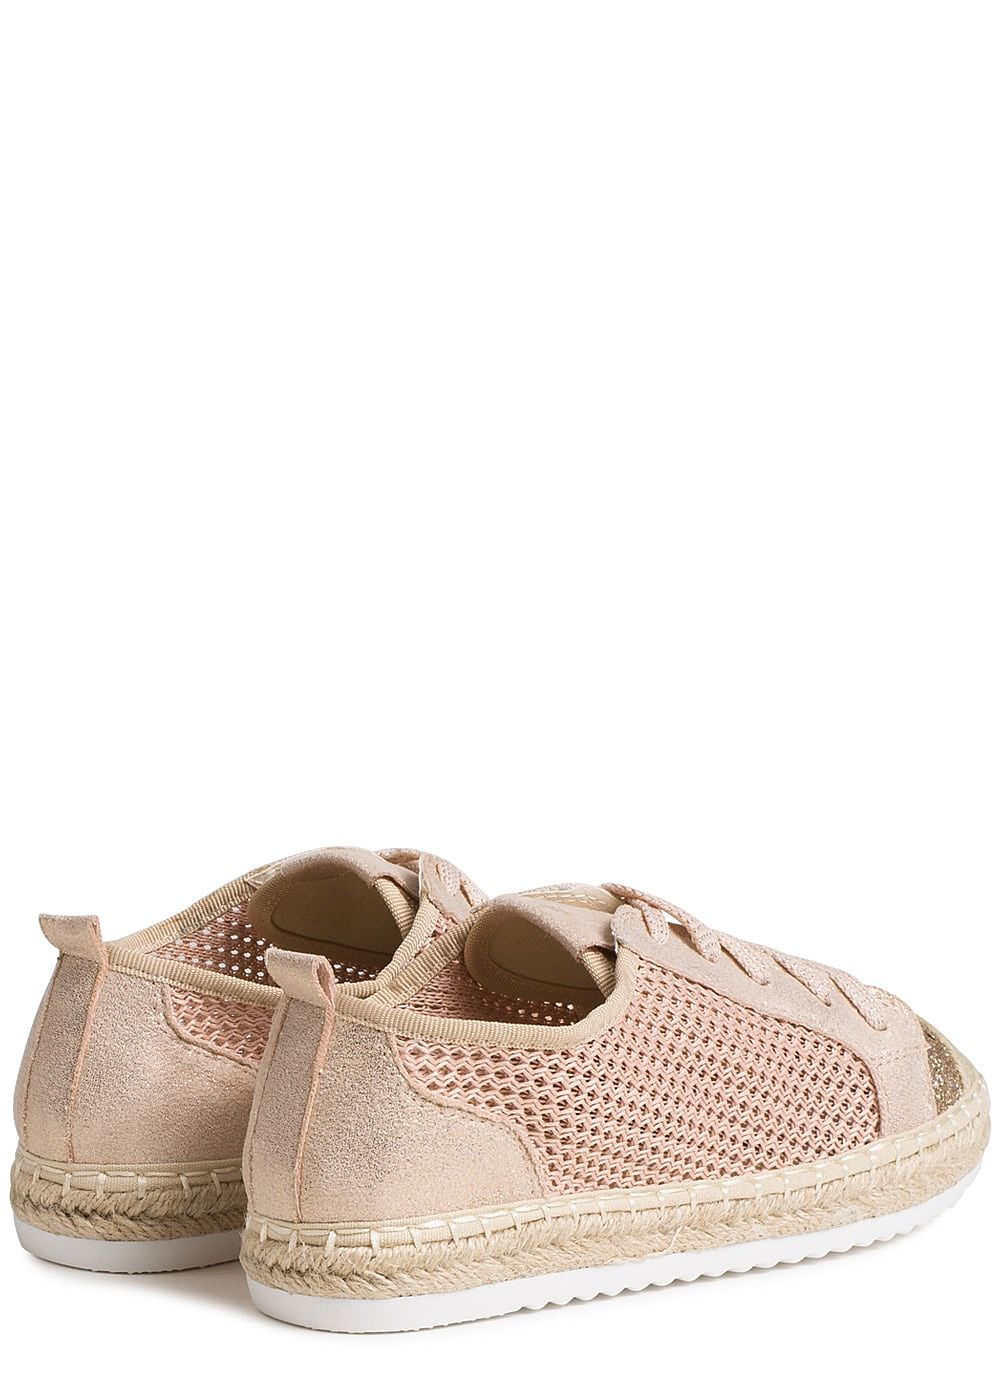 9dd1034abb36c1 Seventyseven Lifestyle Schuh Damen Sommer Sneaker Glitzer hell rosa ...